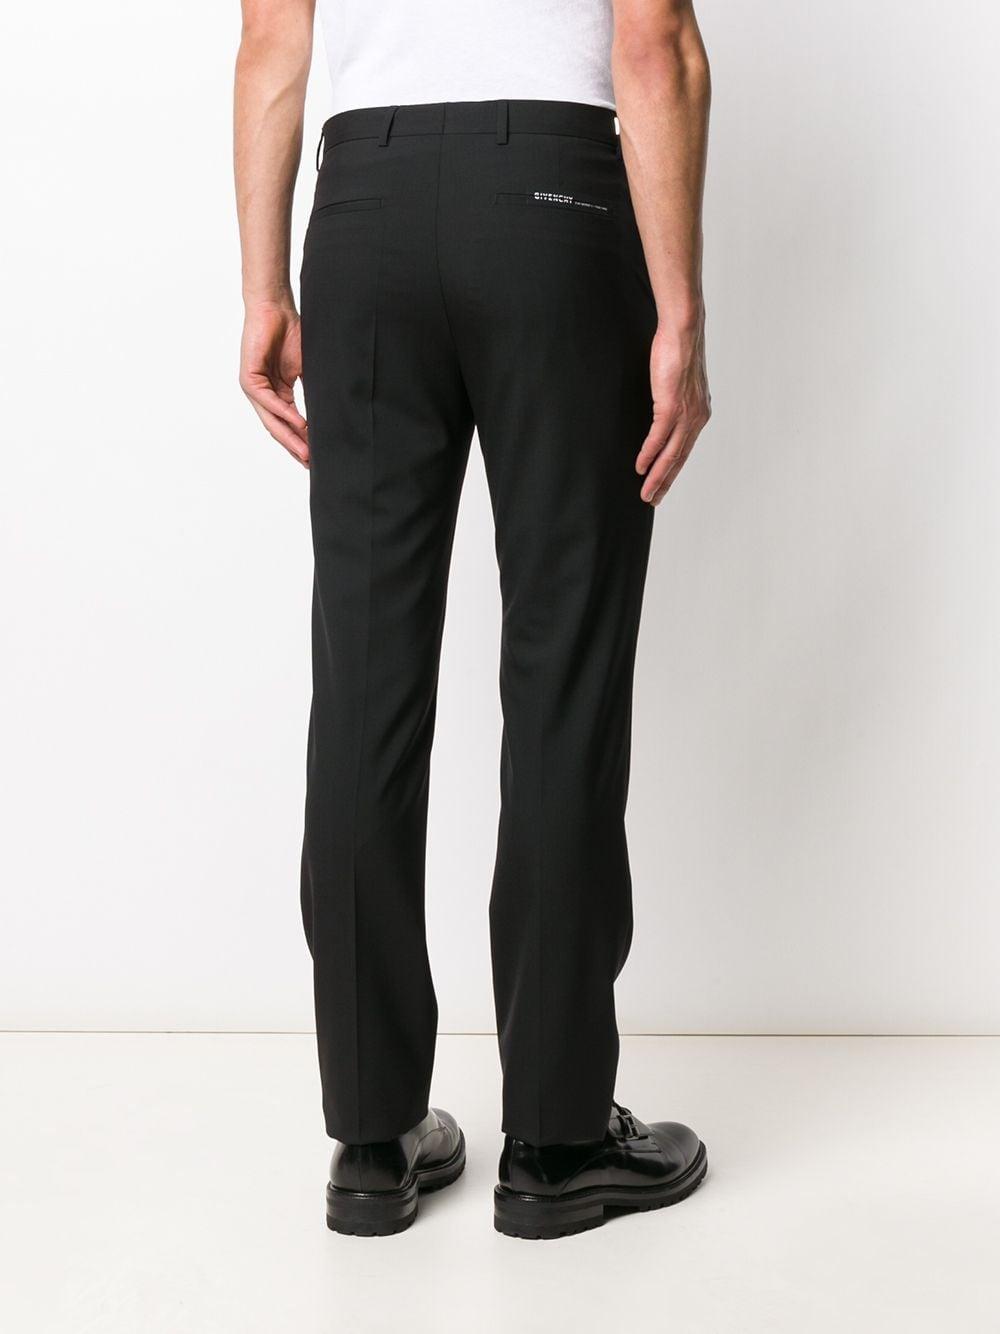 pantalone classico dritto in lana nera con logo Givenchy sulla tasca posteriore GIVENCHY | Pantaloni | BM50K0100B001